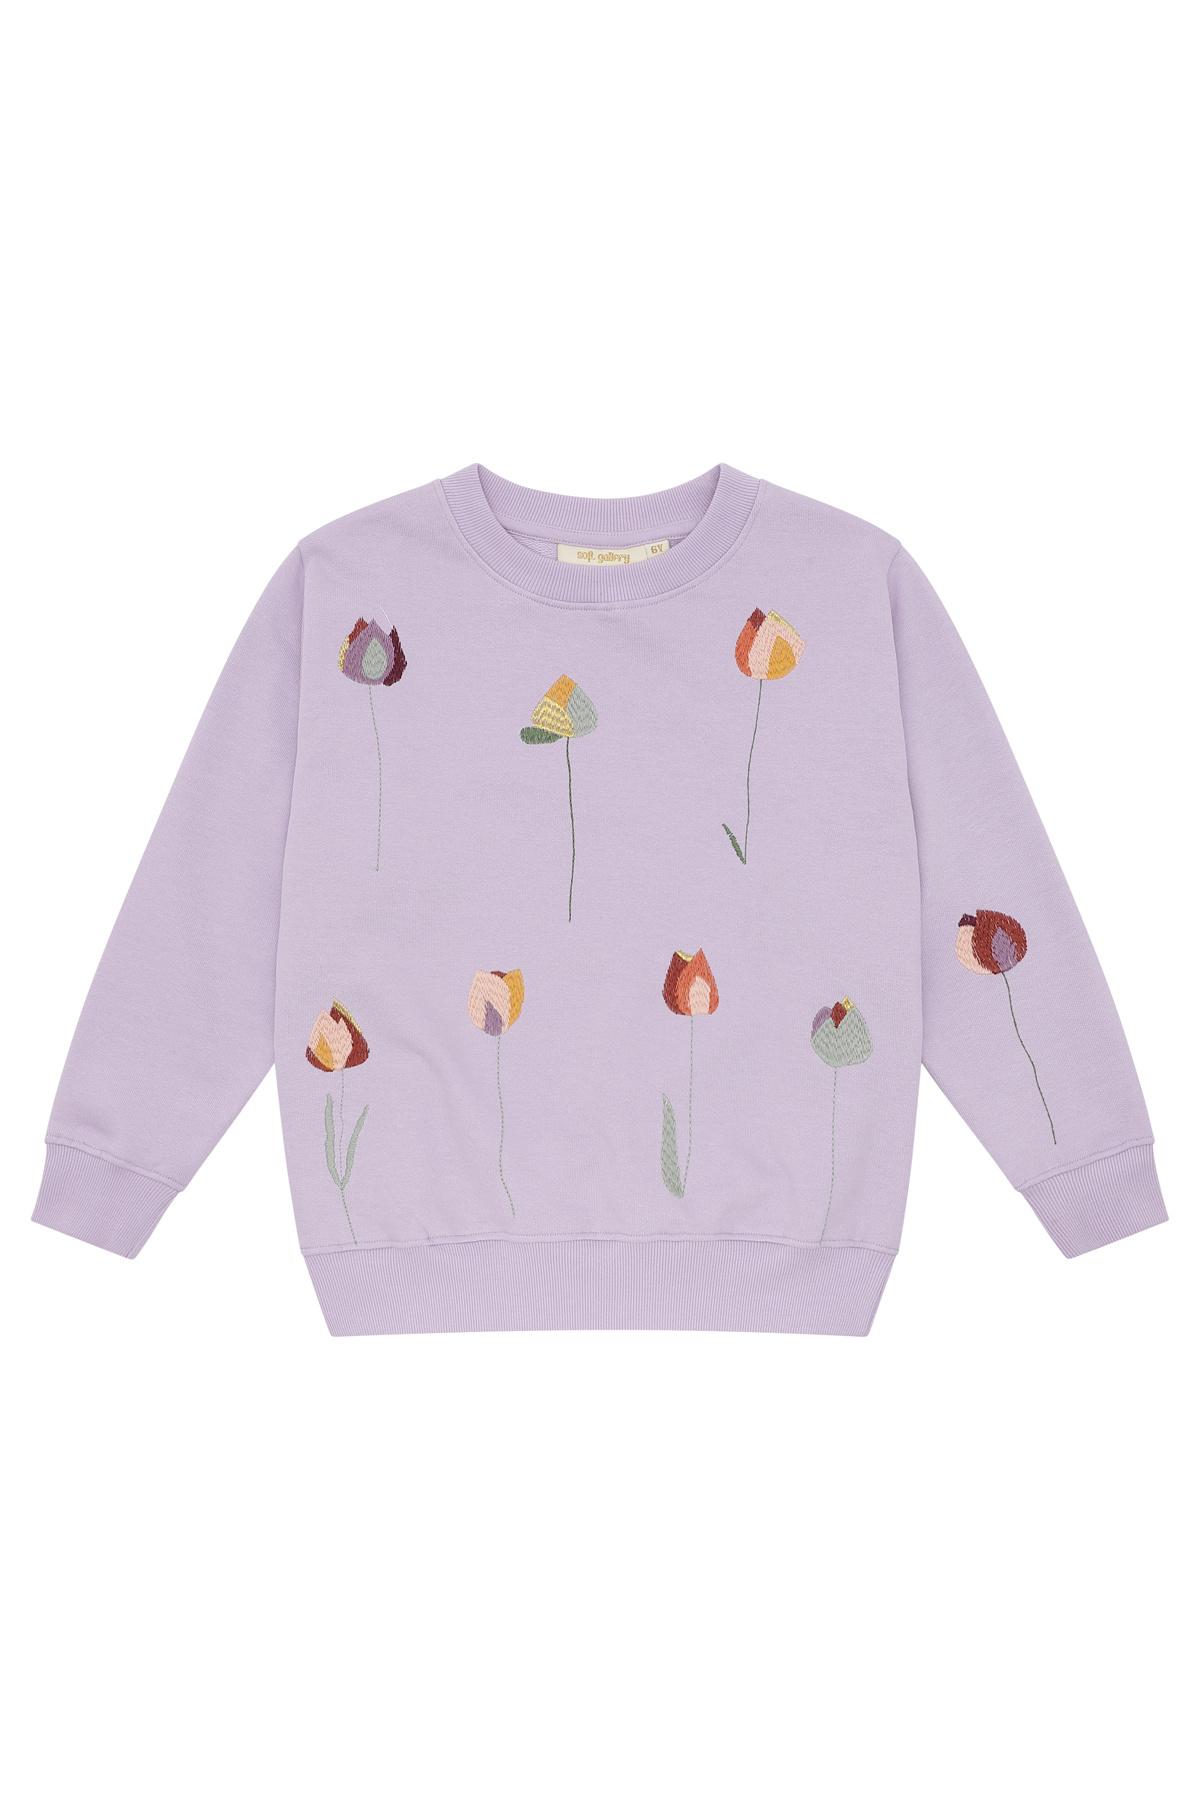 Baptiste sweatshirt - Lavender Frost-1